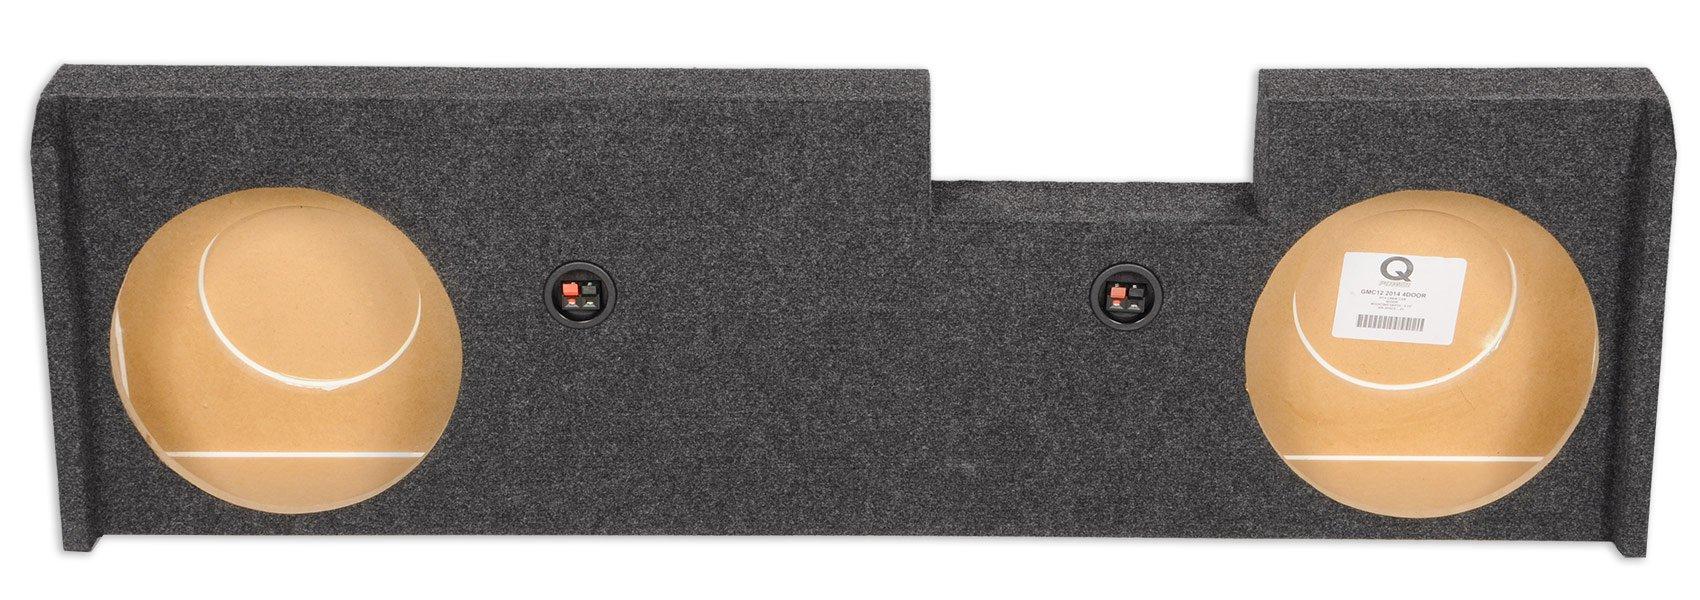 "Rockville Dual 10"" Sub Enclosure Box for 2014 and Up GMC/Chevy Sierra/Silverado"